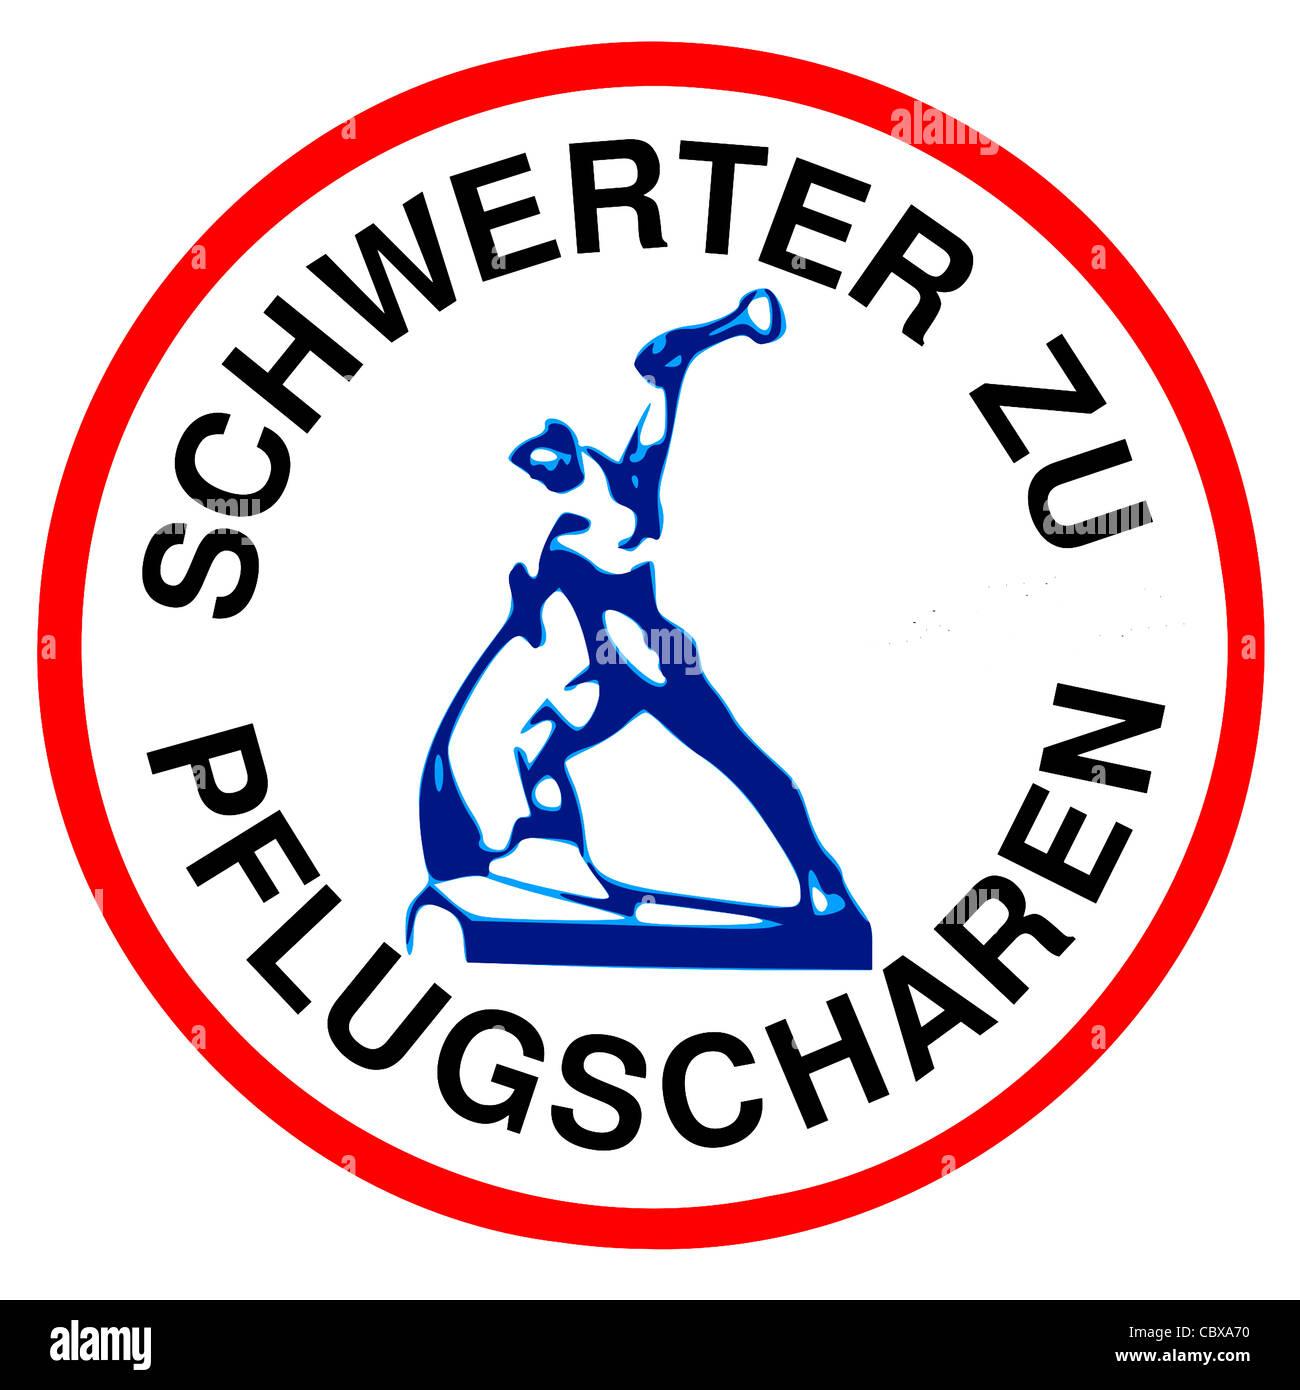 Logo der Friedensbewegung der DDR. Stockbild